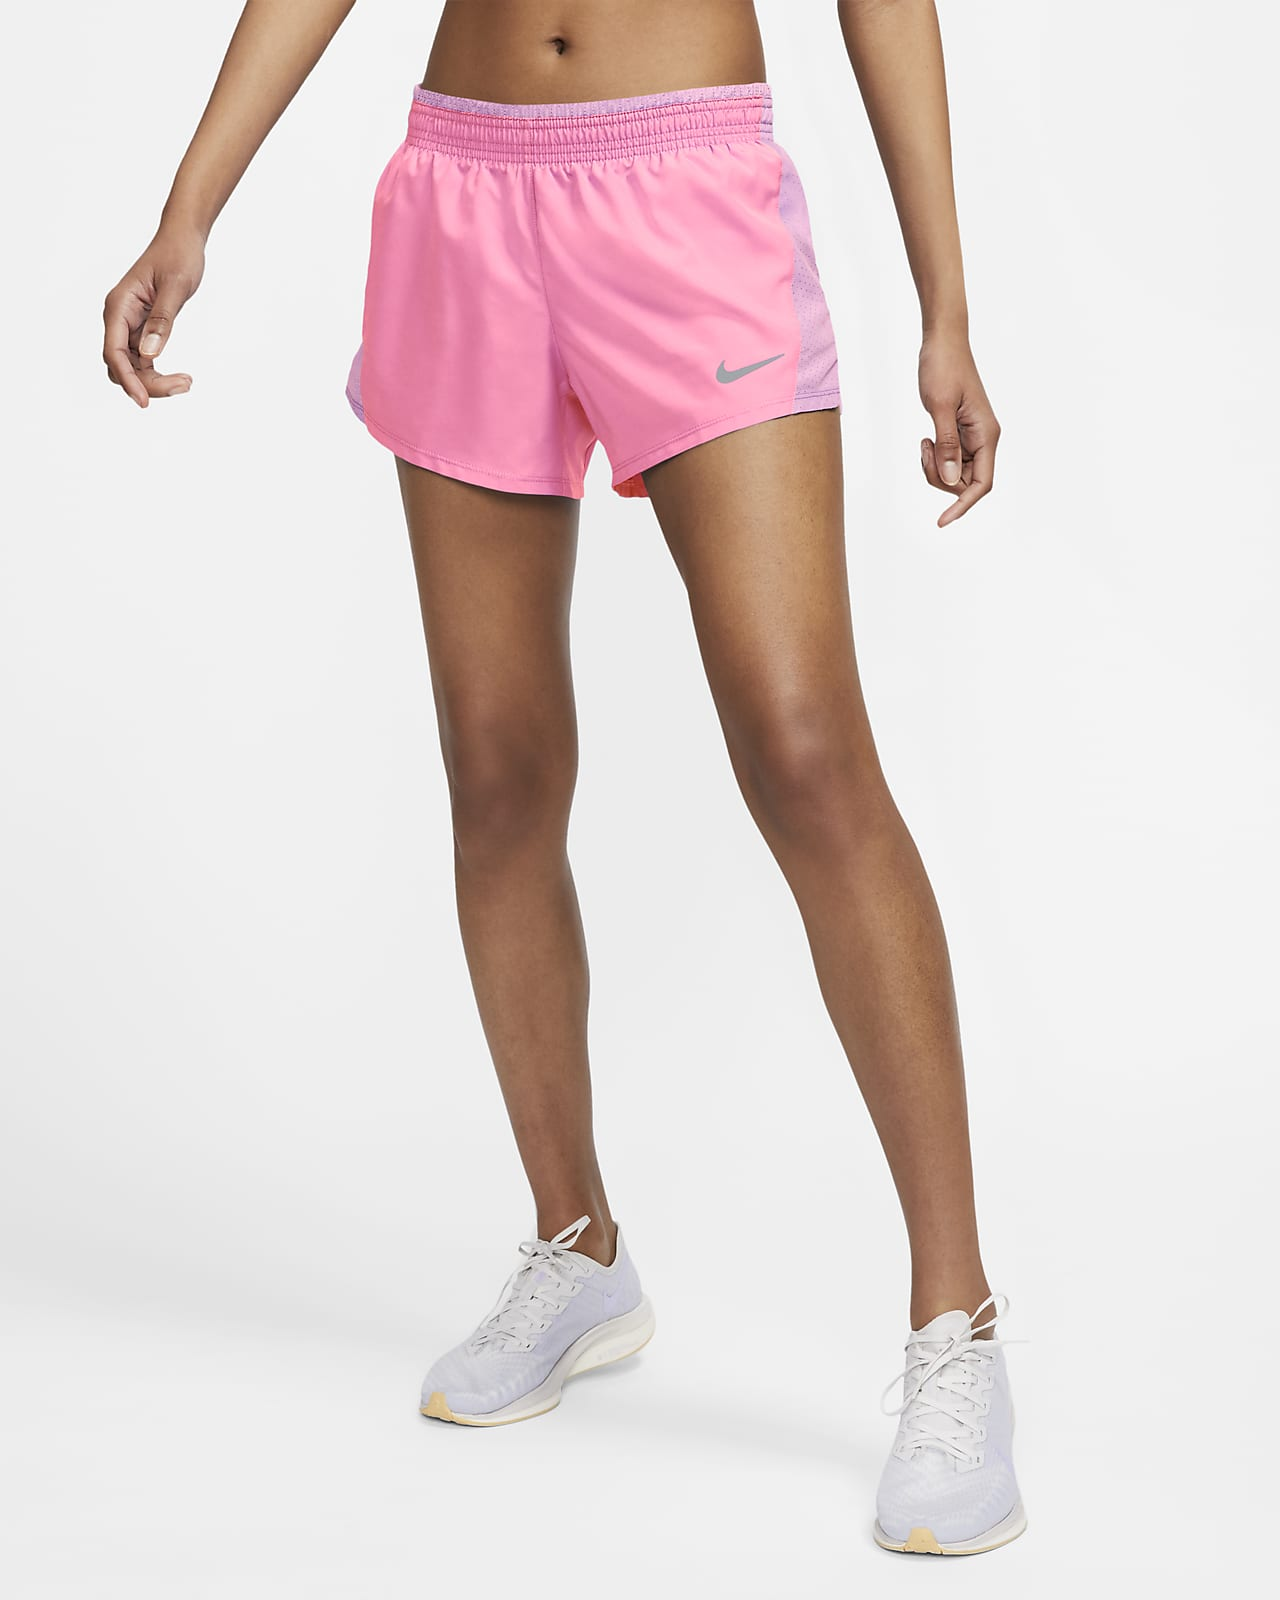 Nike 10K Pantalón corto de running - Mujer